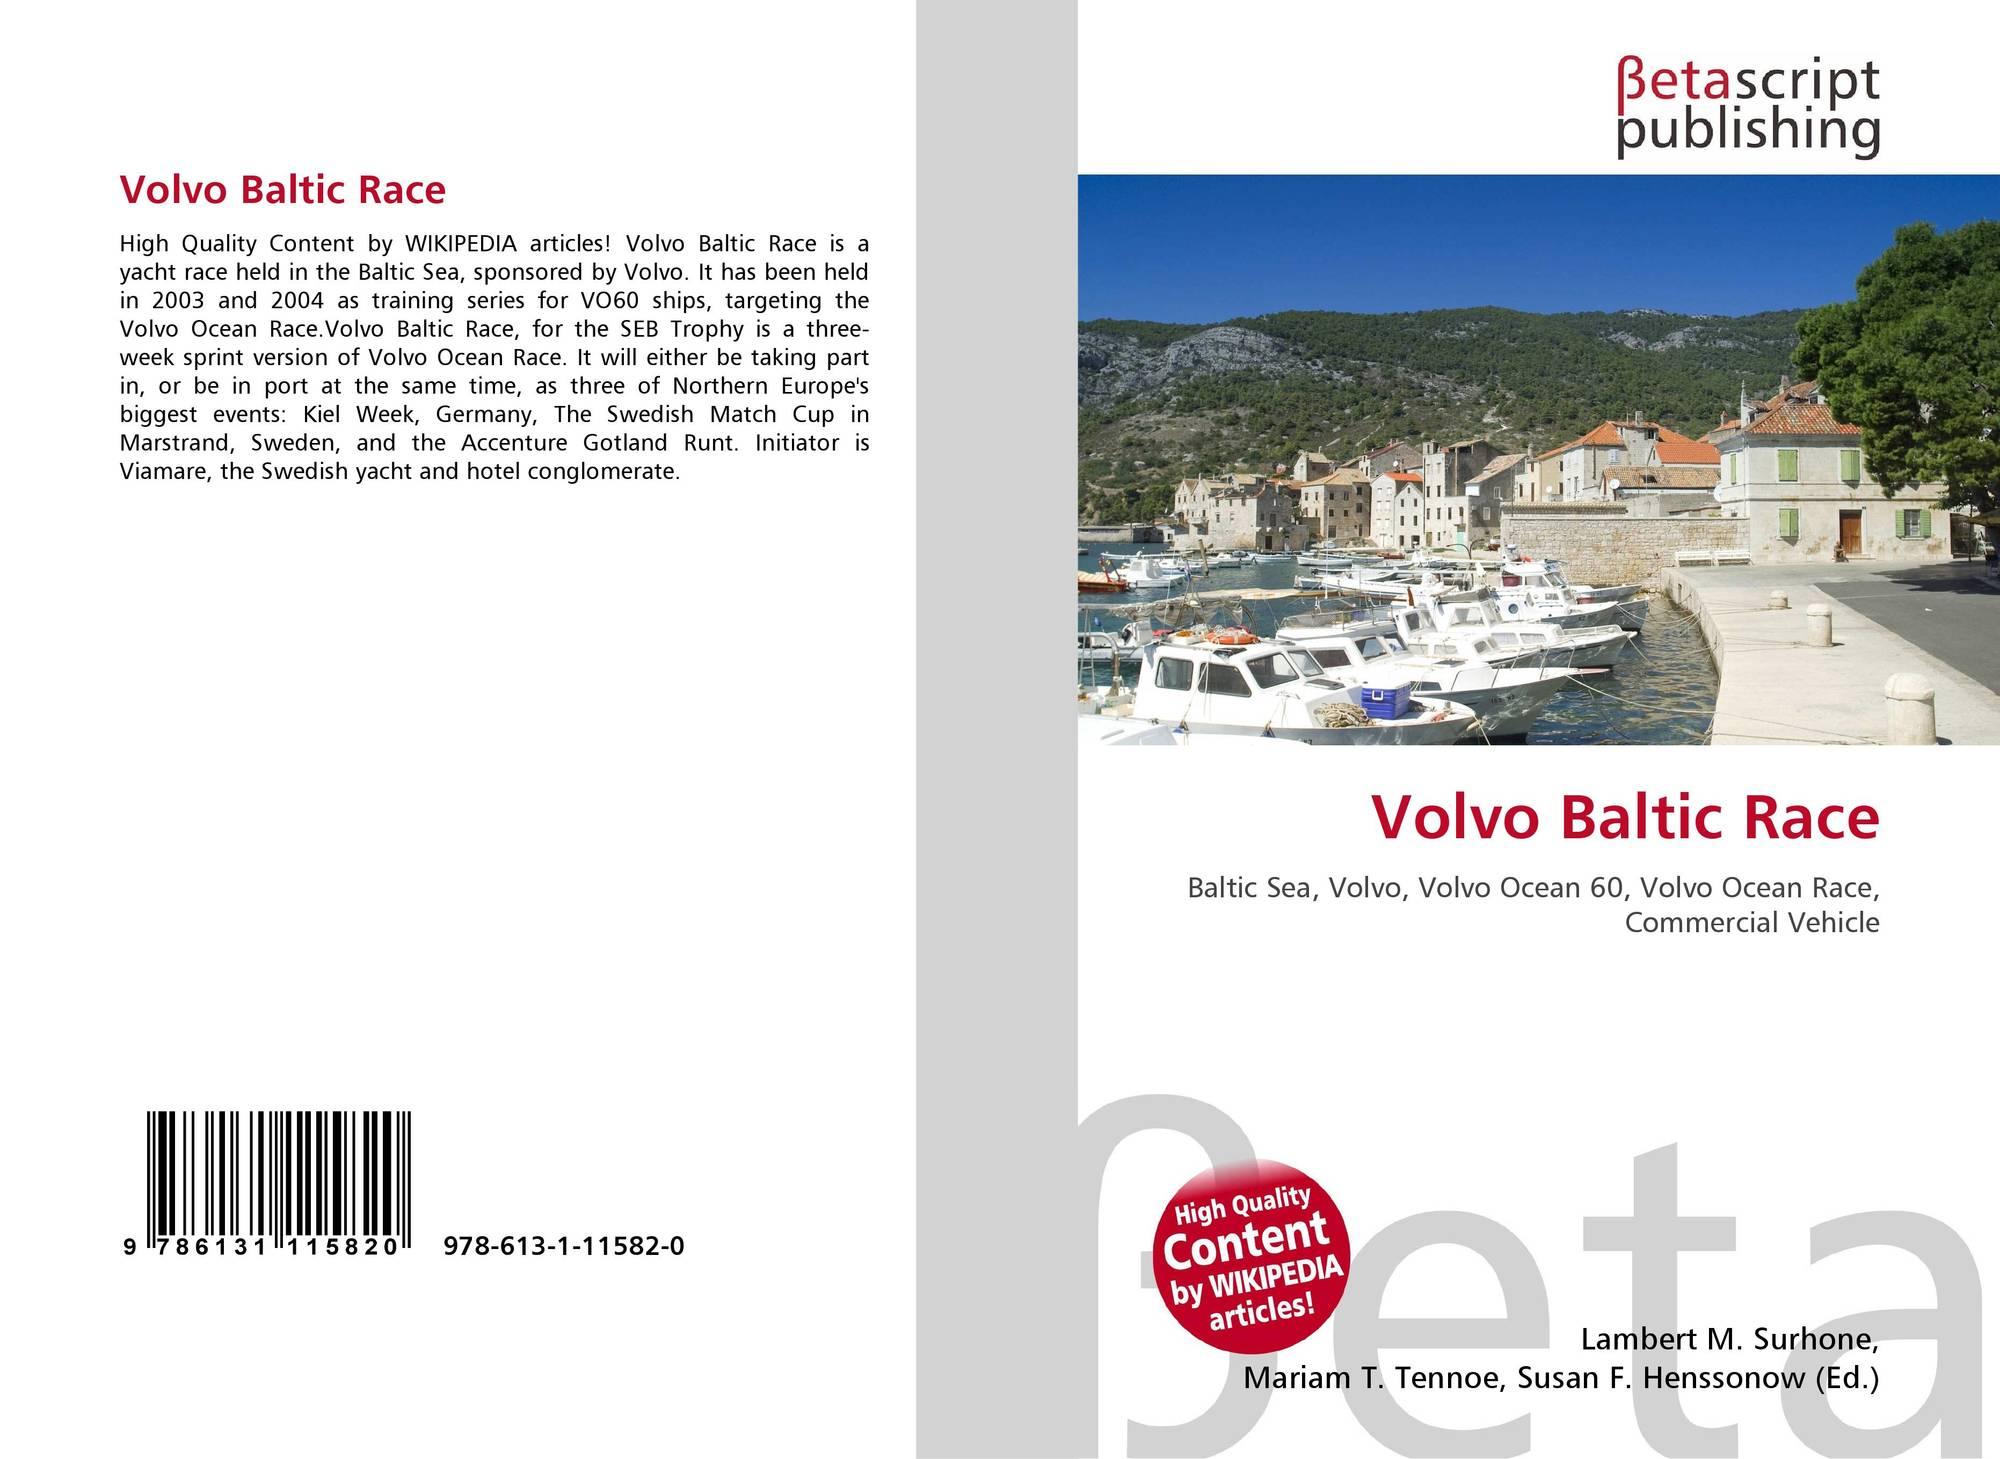 Volvo Baltic Race, 978-613-1-11582-0, 6131115826 ,9786131115820